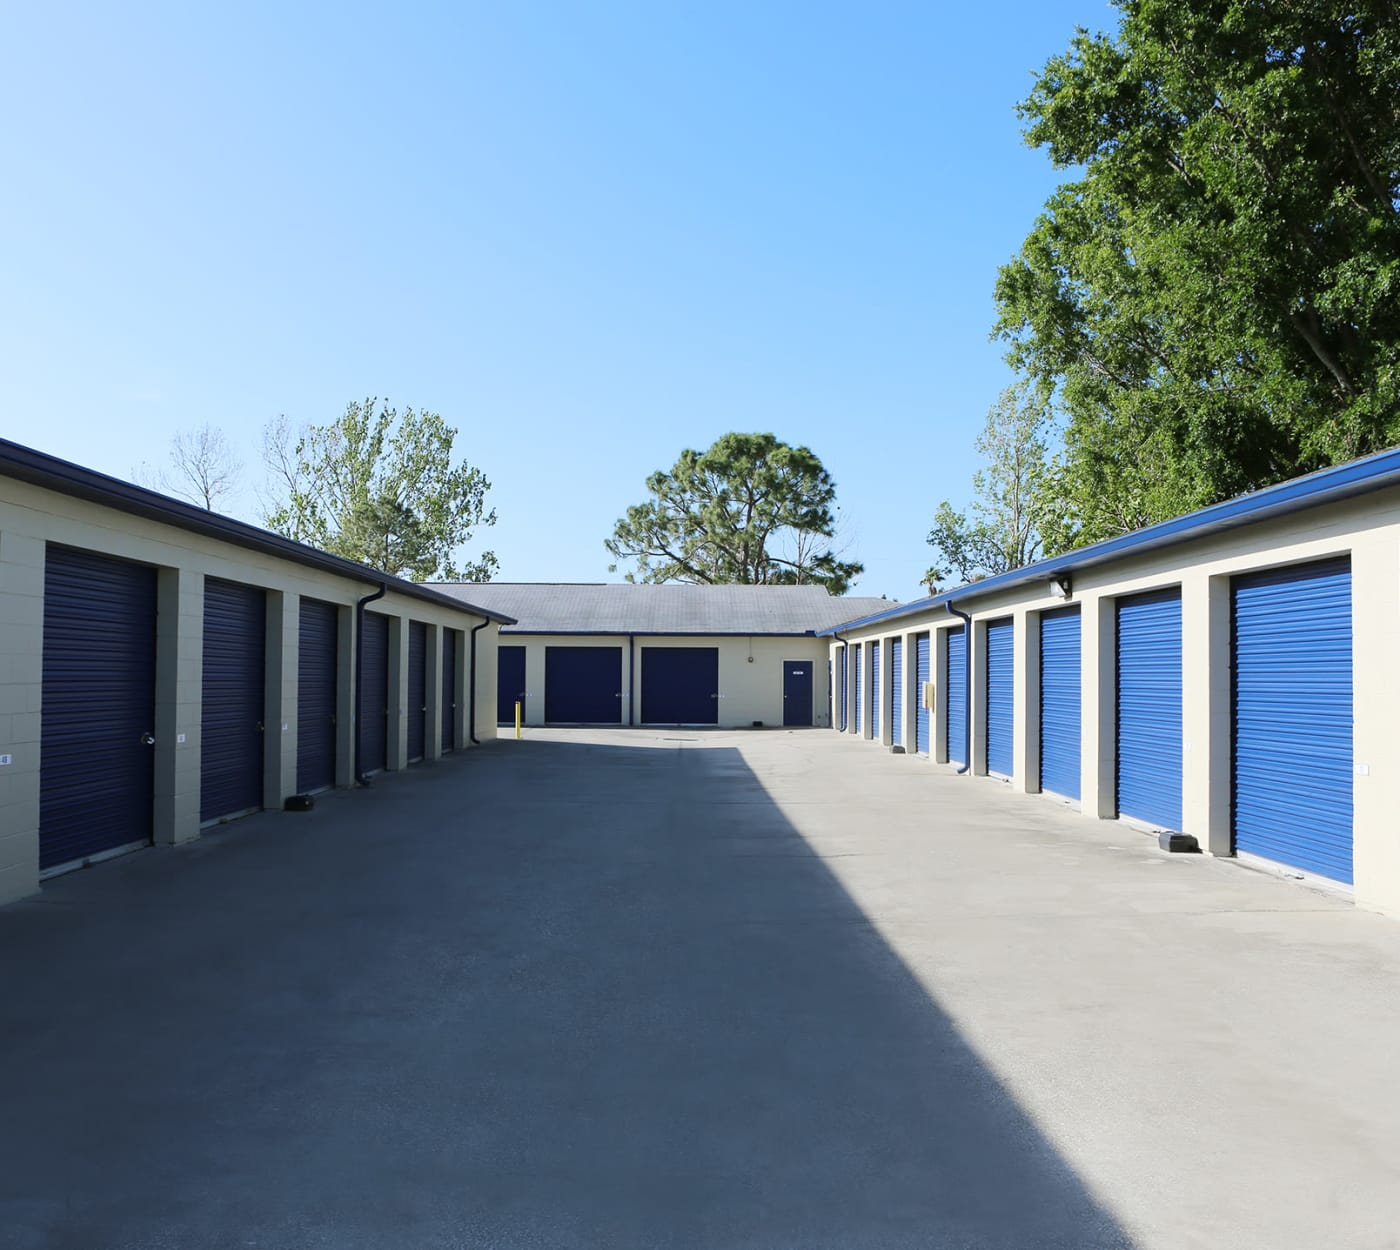 Ground-floor unit at Midgard Self Storage in Savannah, Georgia